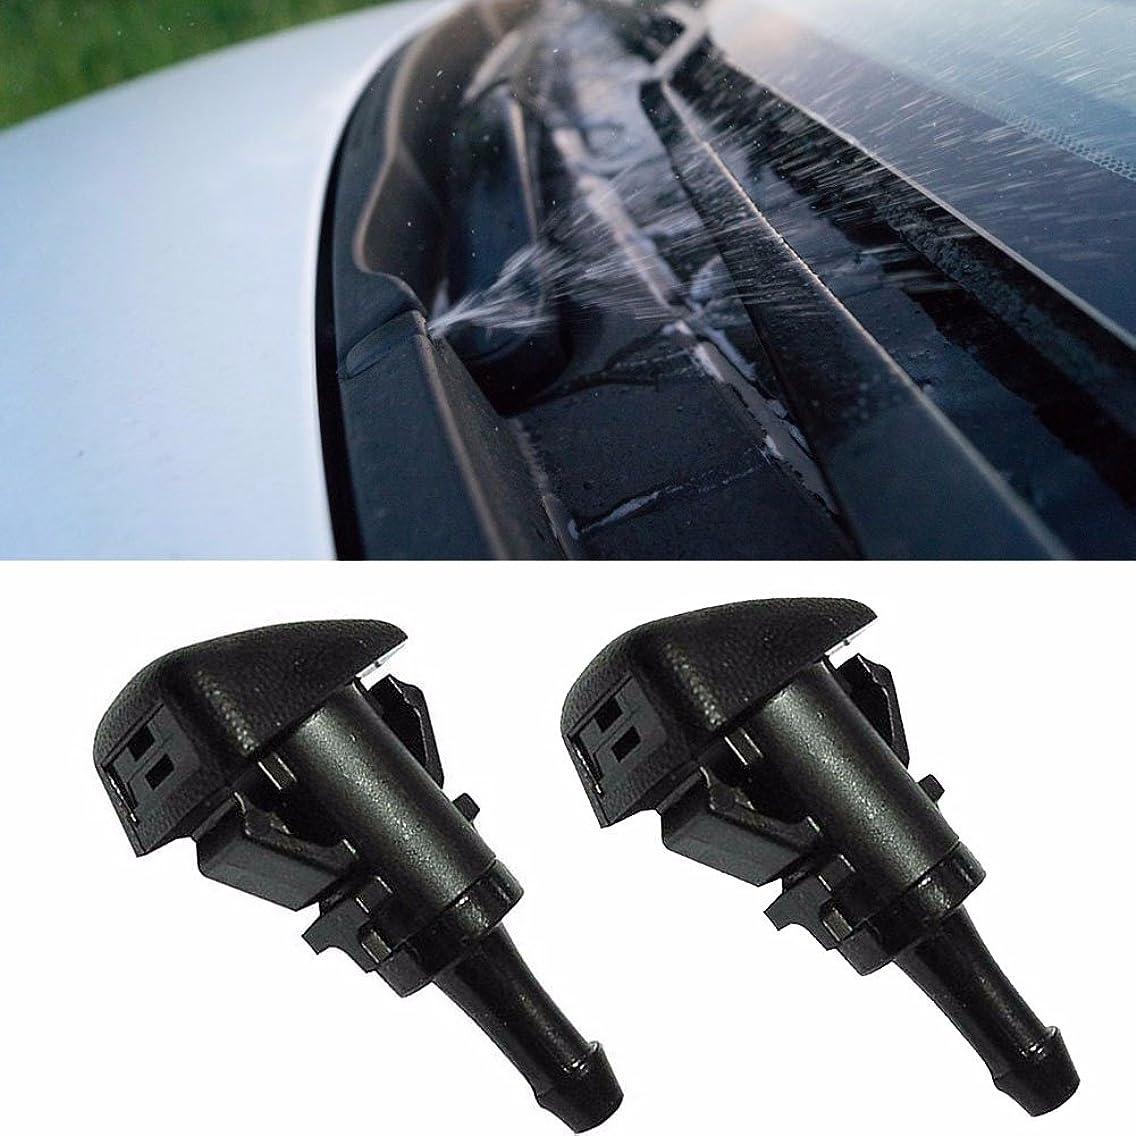 Windshield Spray type washer Nozzle 2P For Hyundai Veracruz ix55 Azera OEM Parts